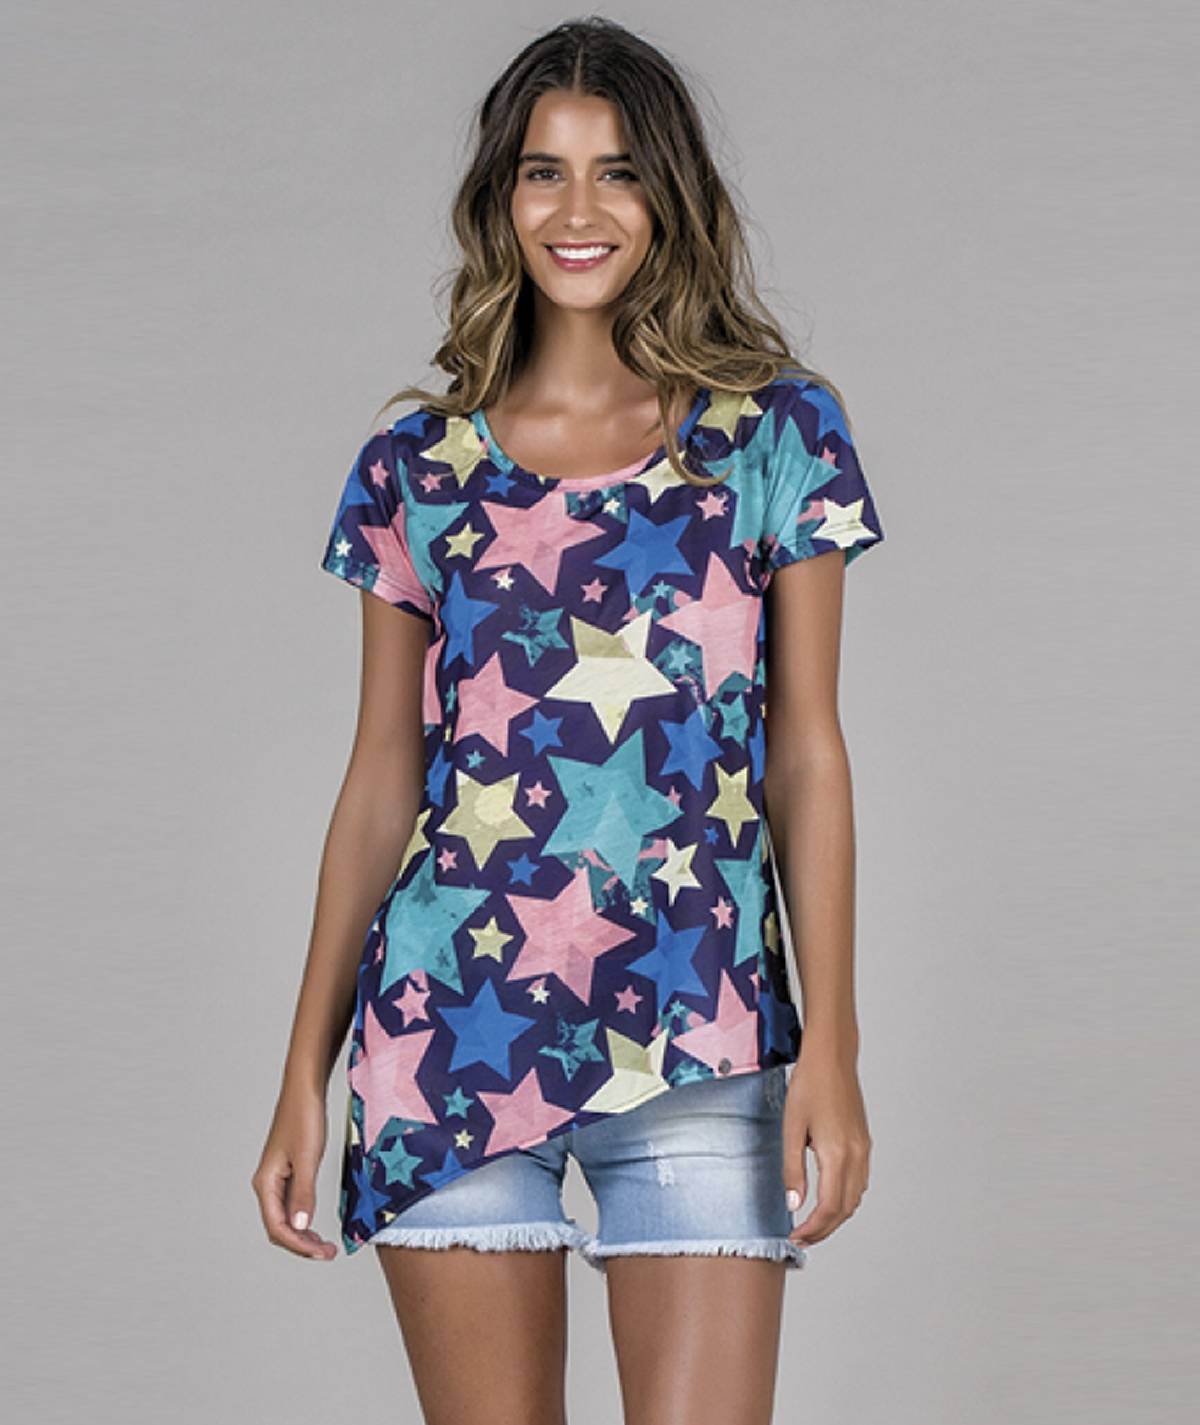 T-shirt assimétrica estrelas